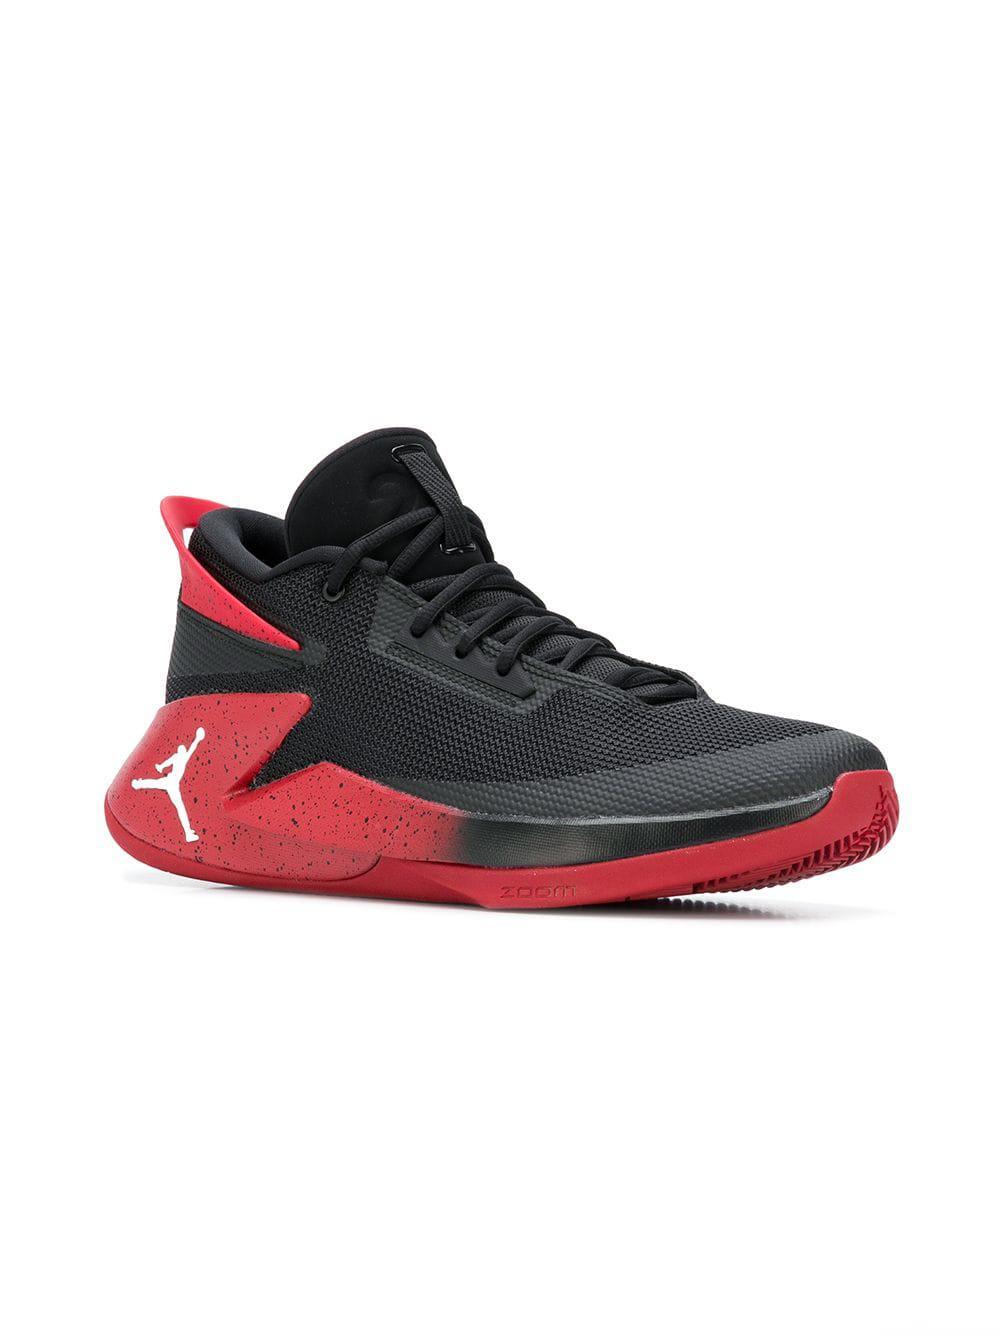 official photos 1ca2f a7bee Nike Jordan Fly Lockdown Sneakers in Black for Men - Lyst